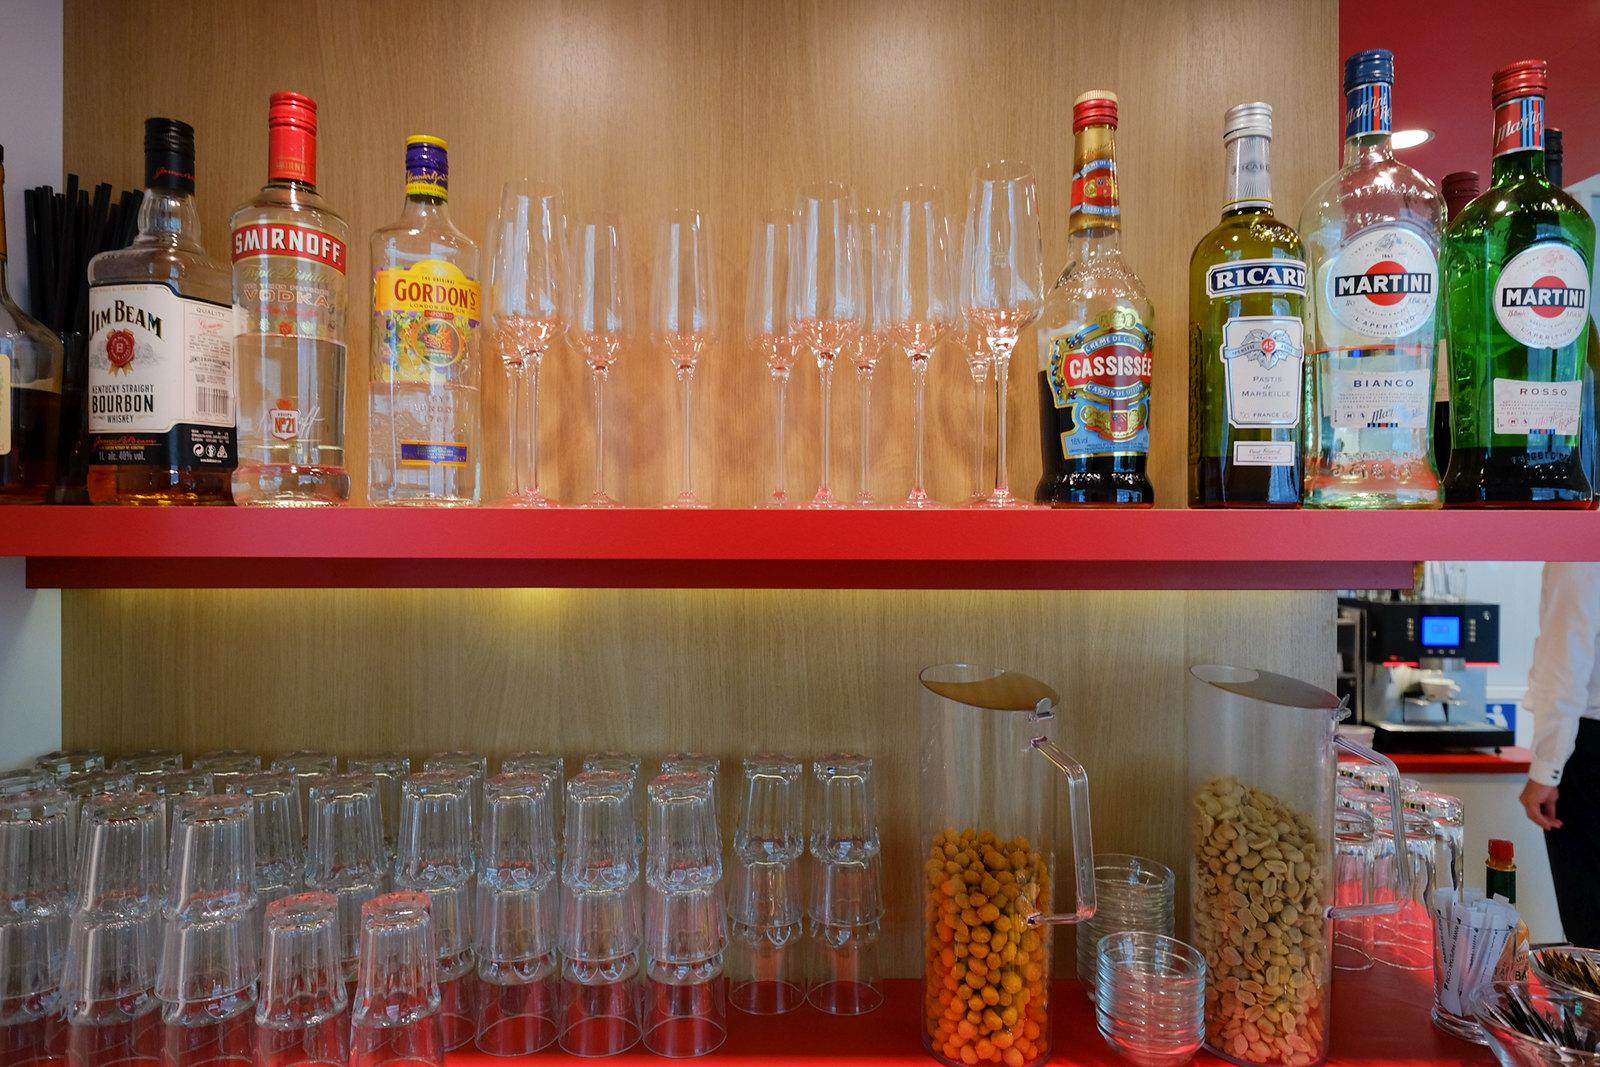 Alcoholic liquors and bar snacks